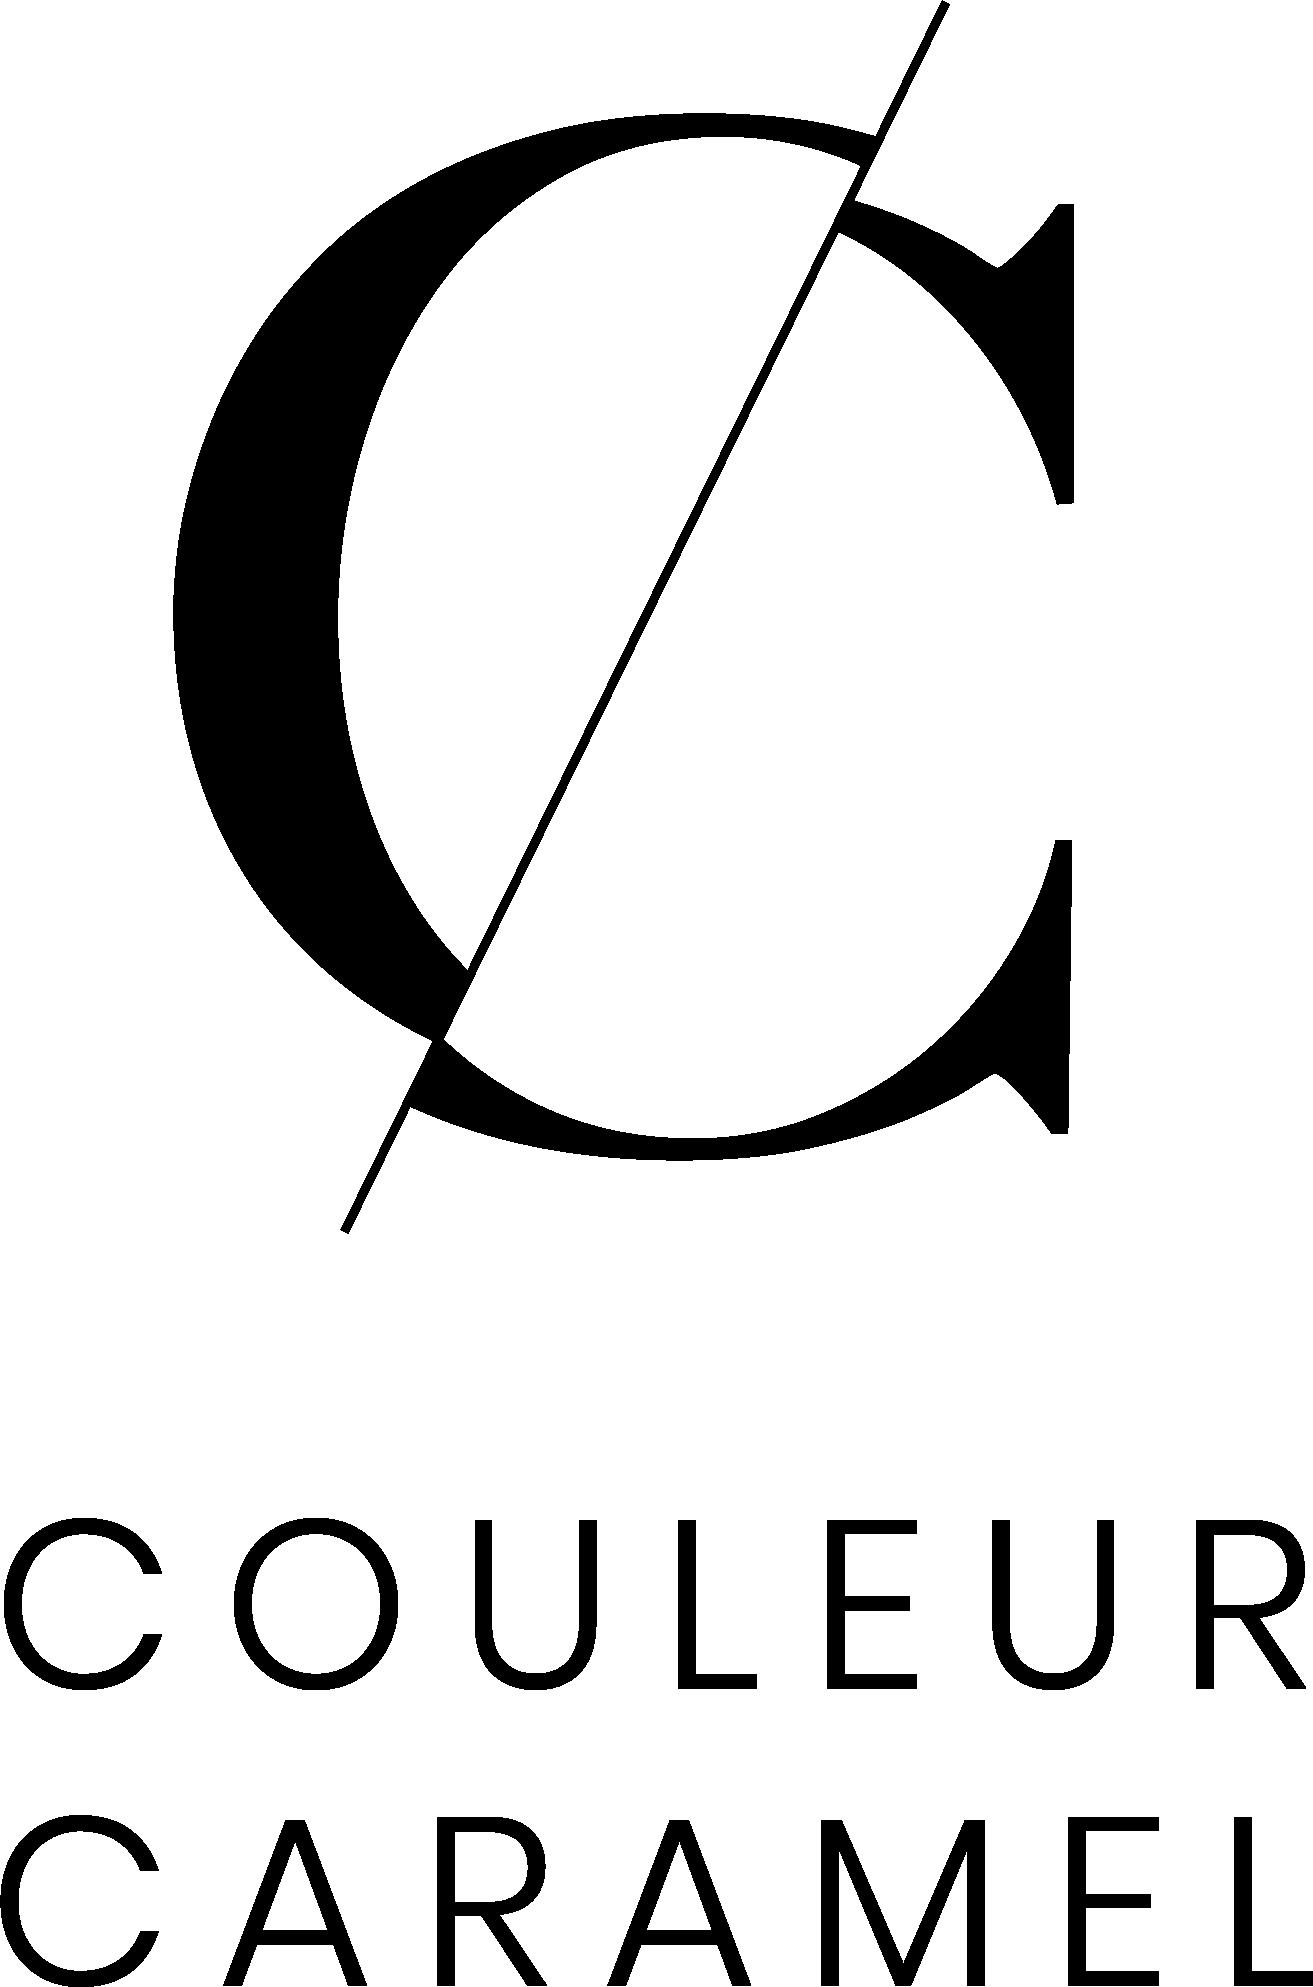 Couleur Caramel